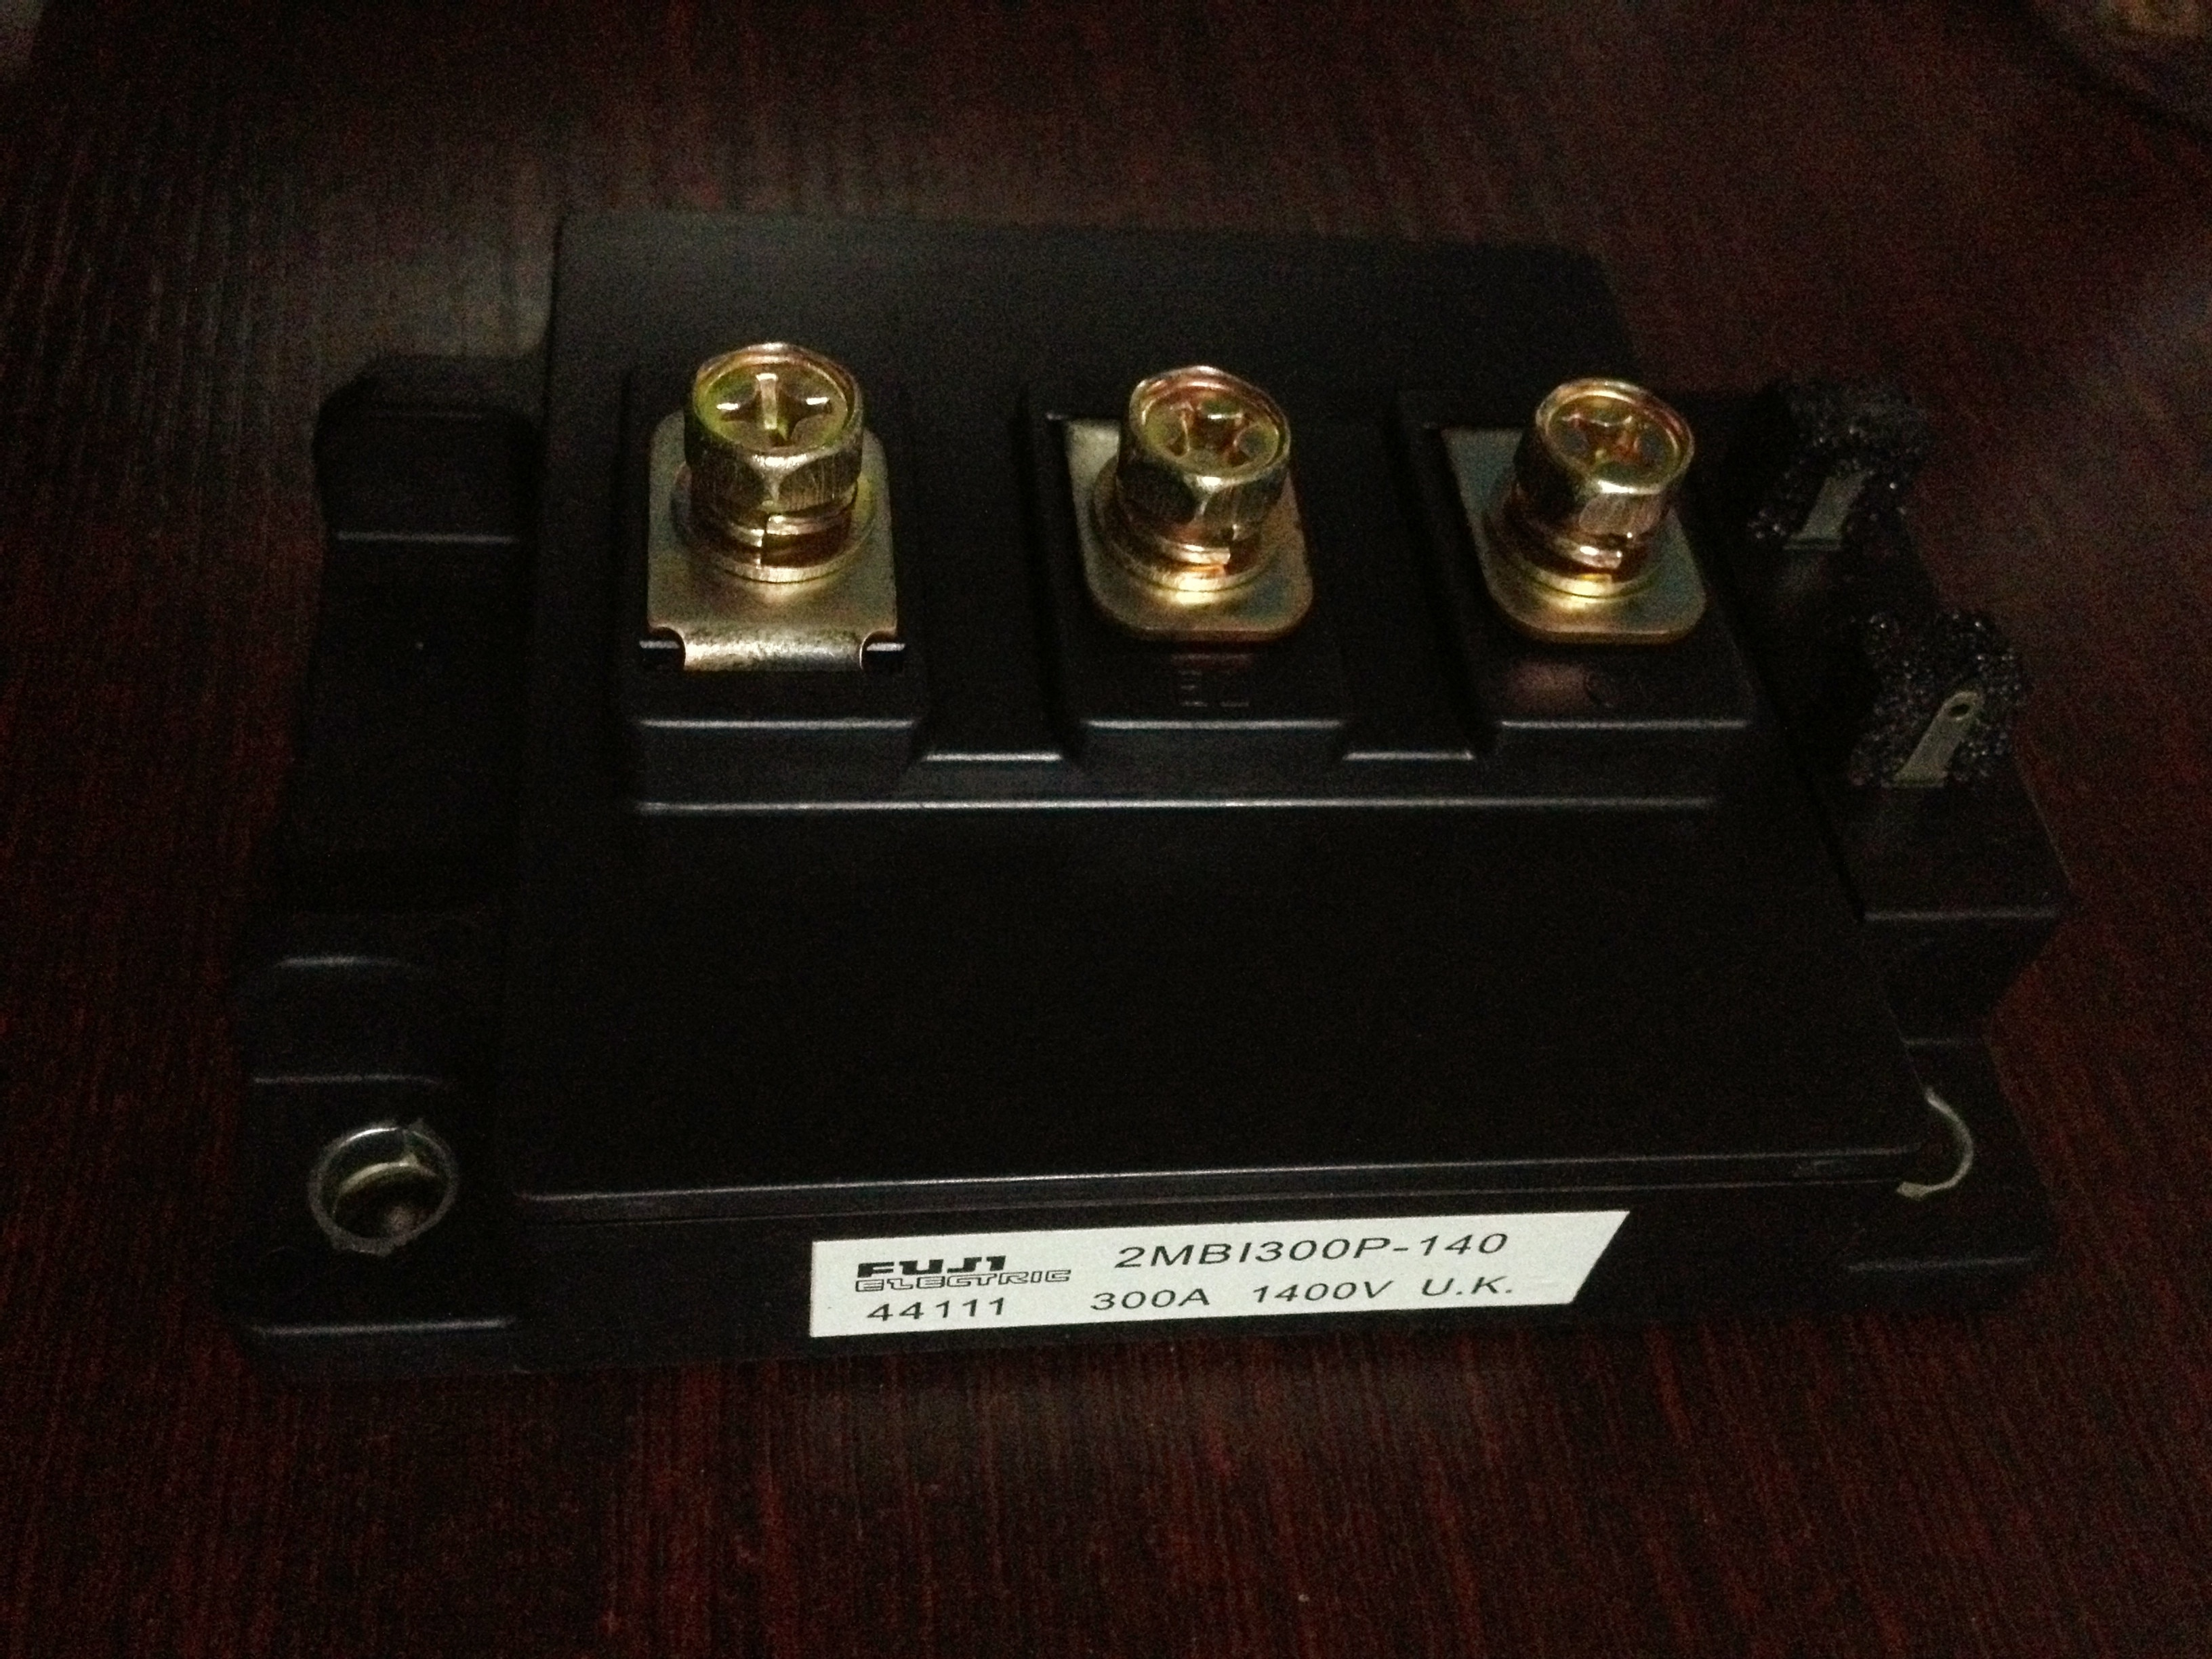 Envío Gratis nuevo 2MBI300P-140 módulo